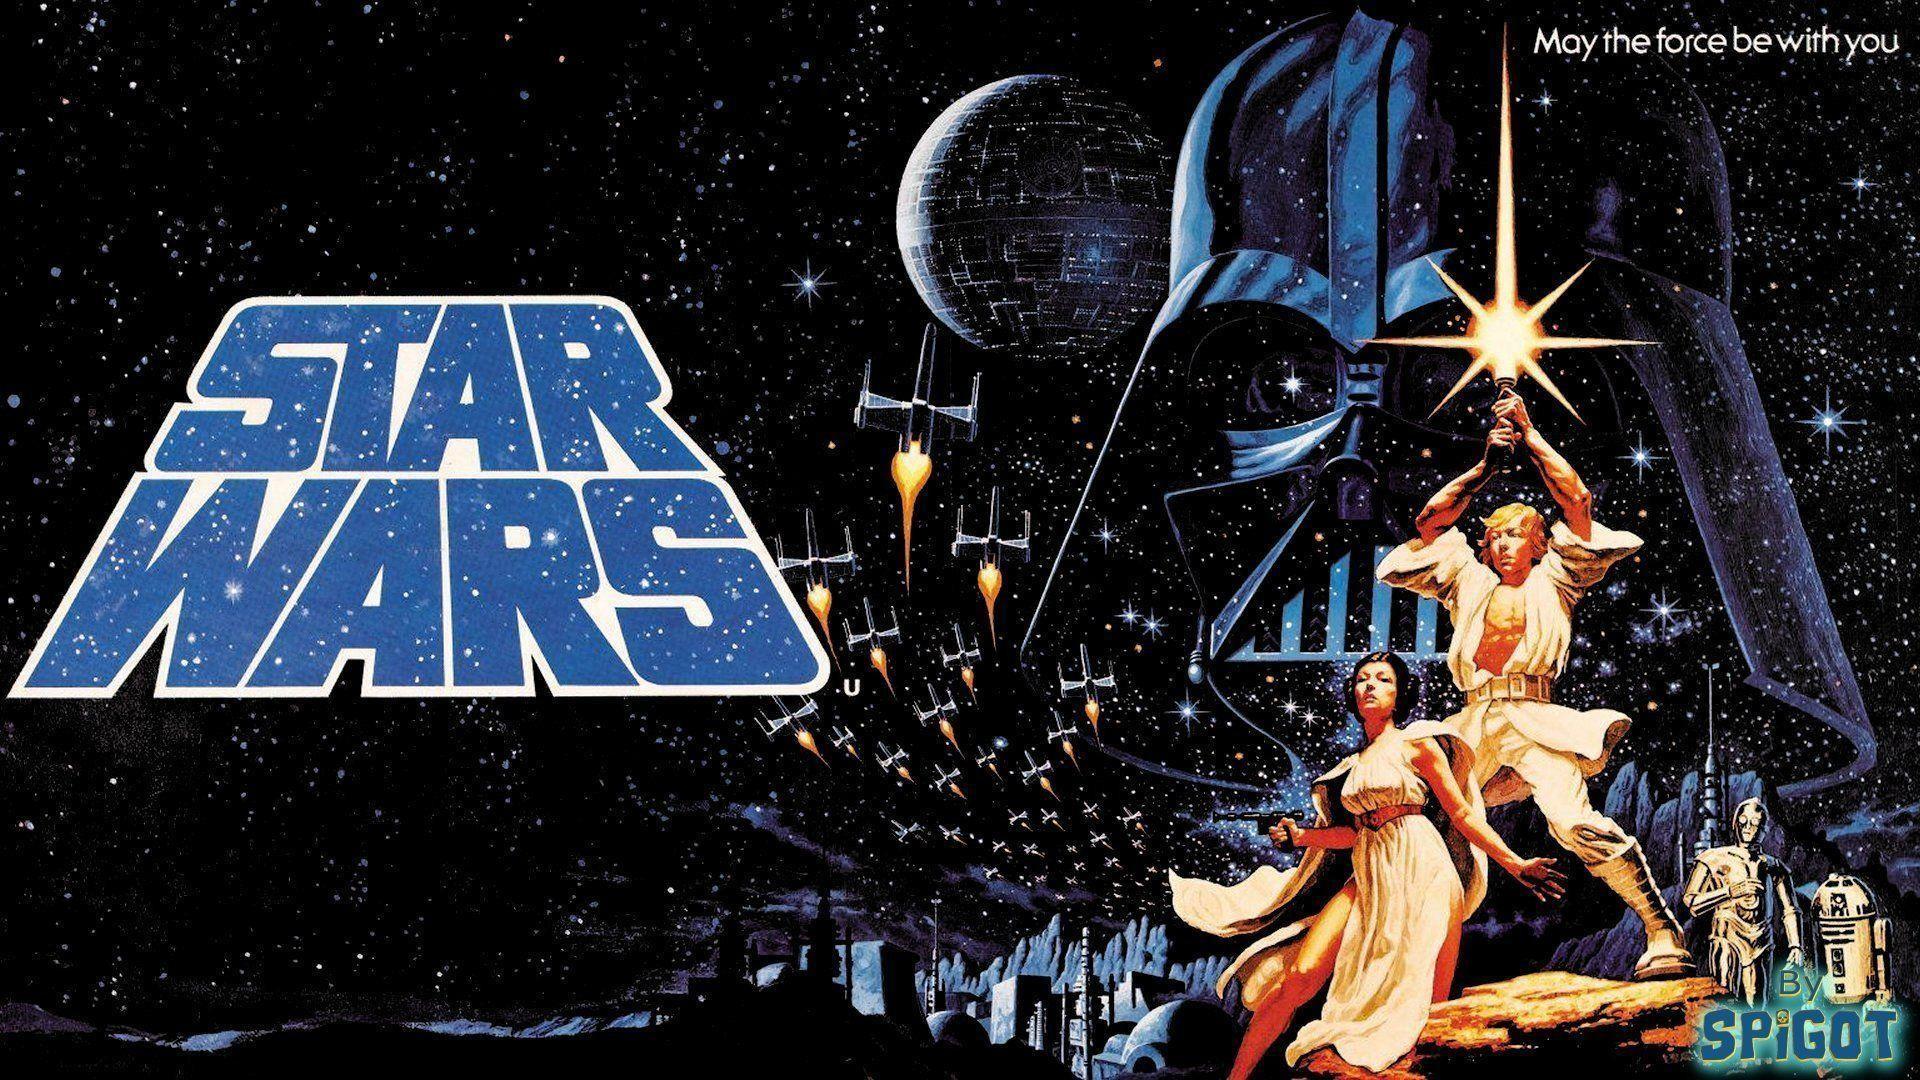 Star Wars Desktop Wallpaper 1920x1080 Posted By Sarah Walker